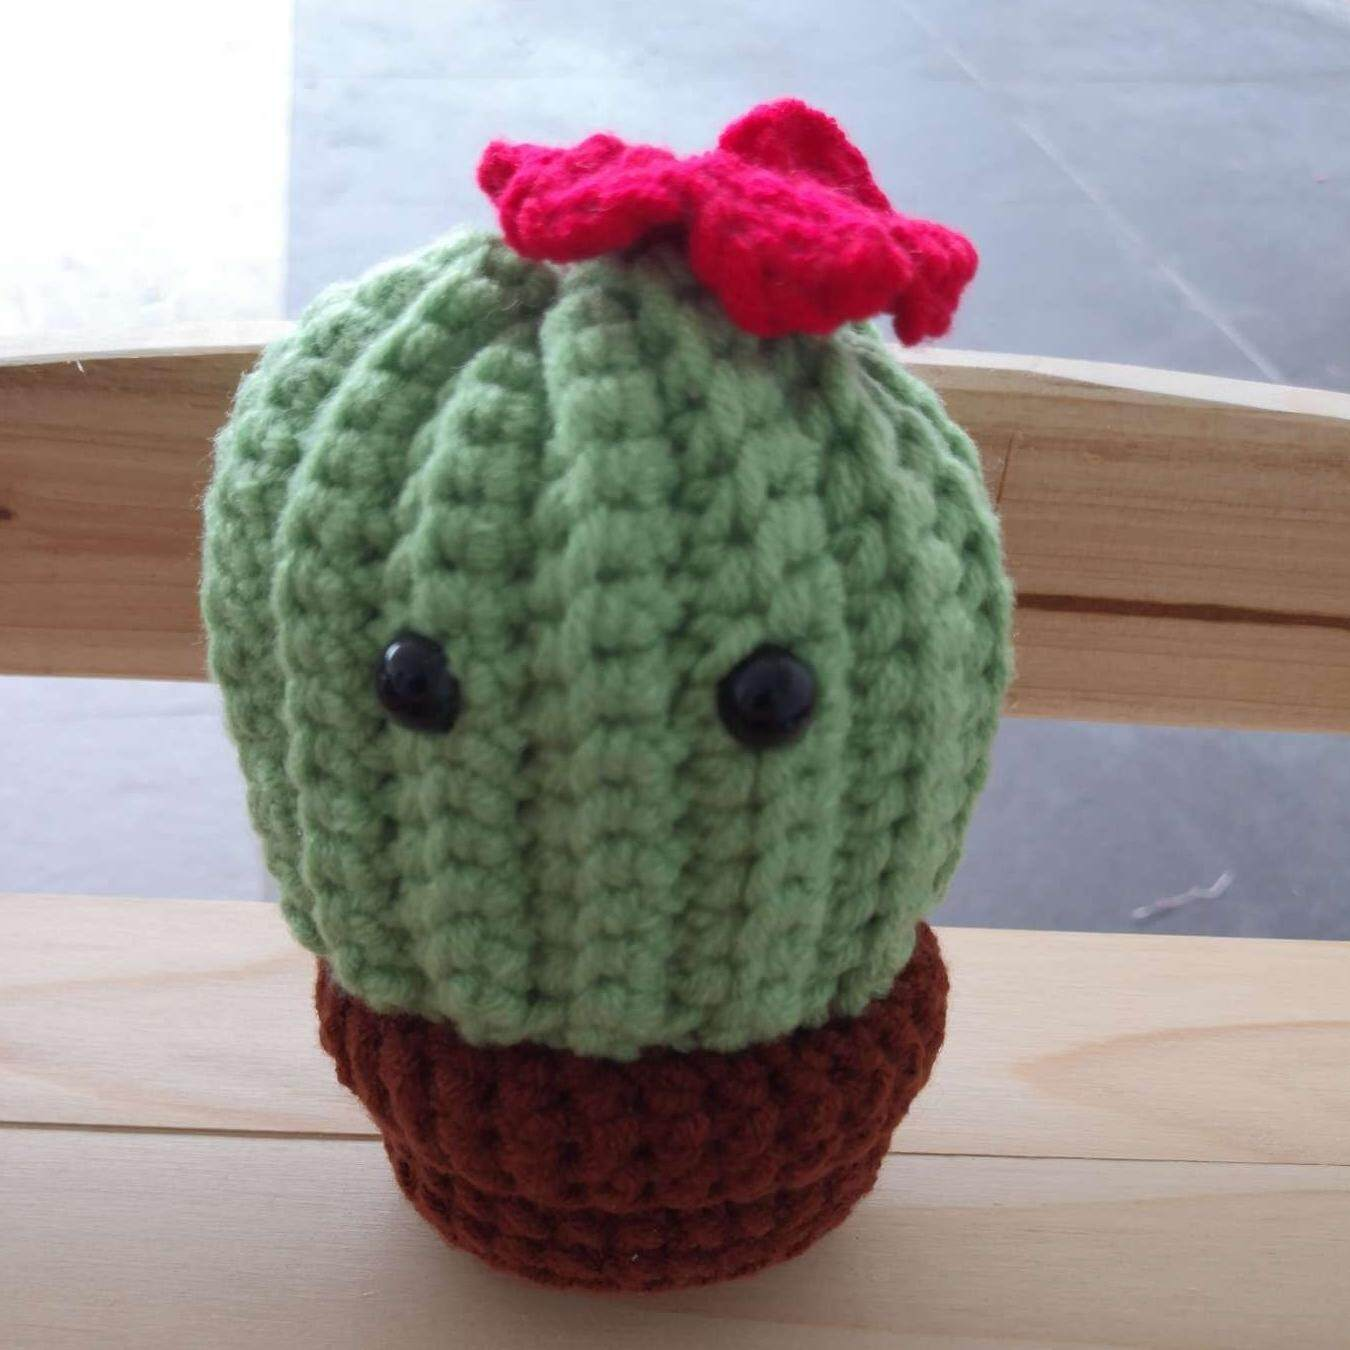 20 Desert Cactus Amigurumi Crochet Patterns - Look Surprisingly Real | 1350x1350